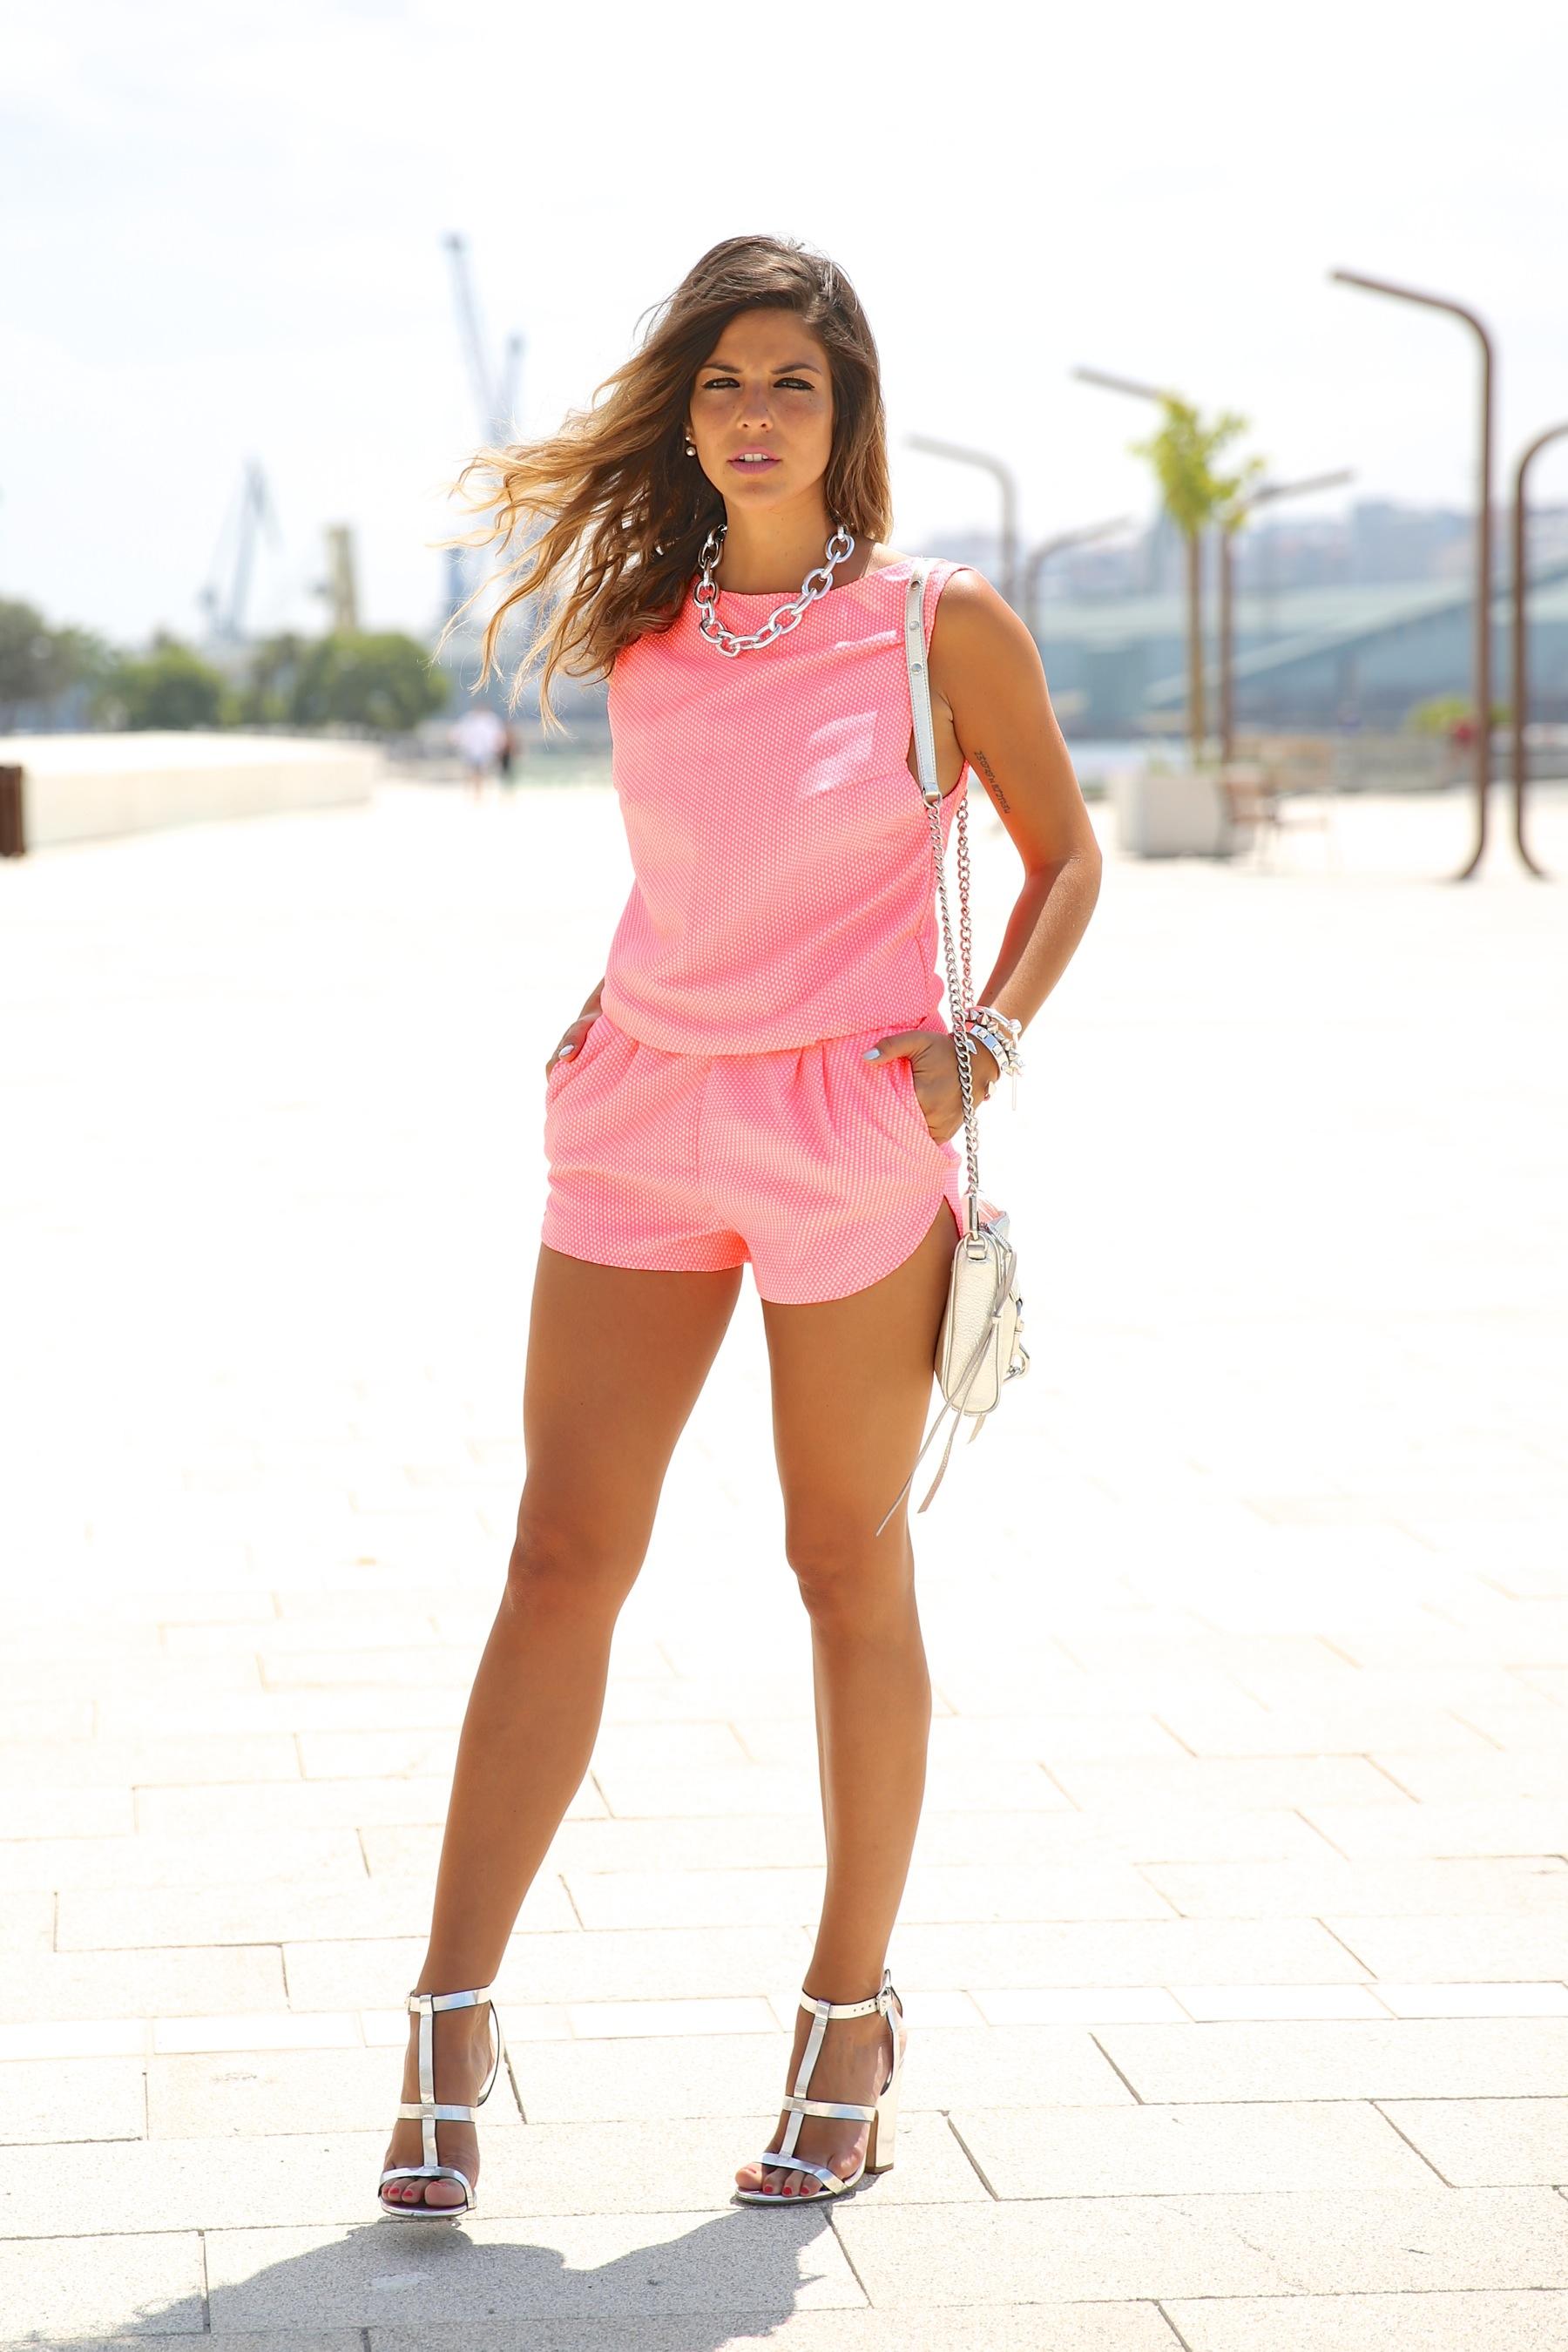 trendy_taste-look-outfit-street_style-ootd-blog-blogger-fashion_spain-moda_españa-silver_bag-bolso_plata-mono_rosa-mekdes-coruña-marina-9